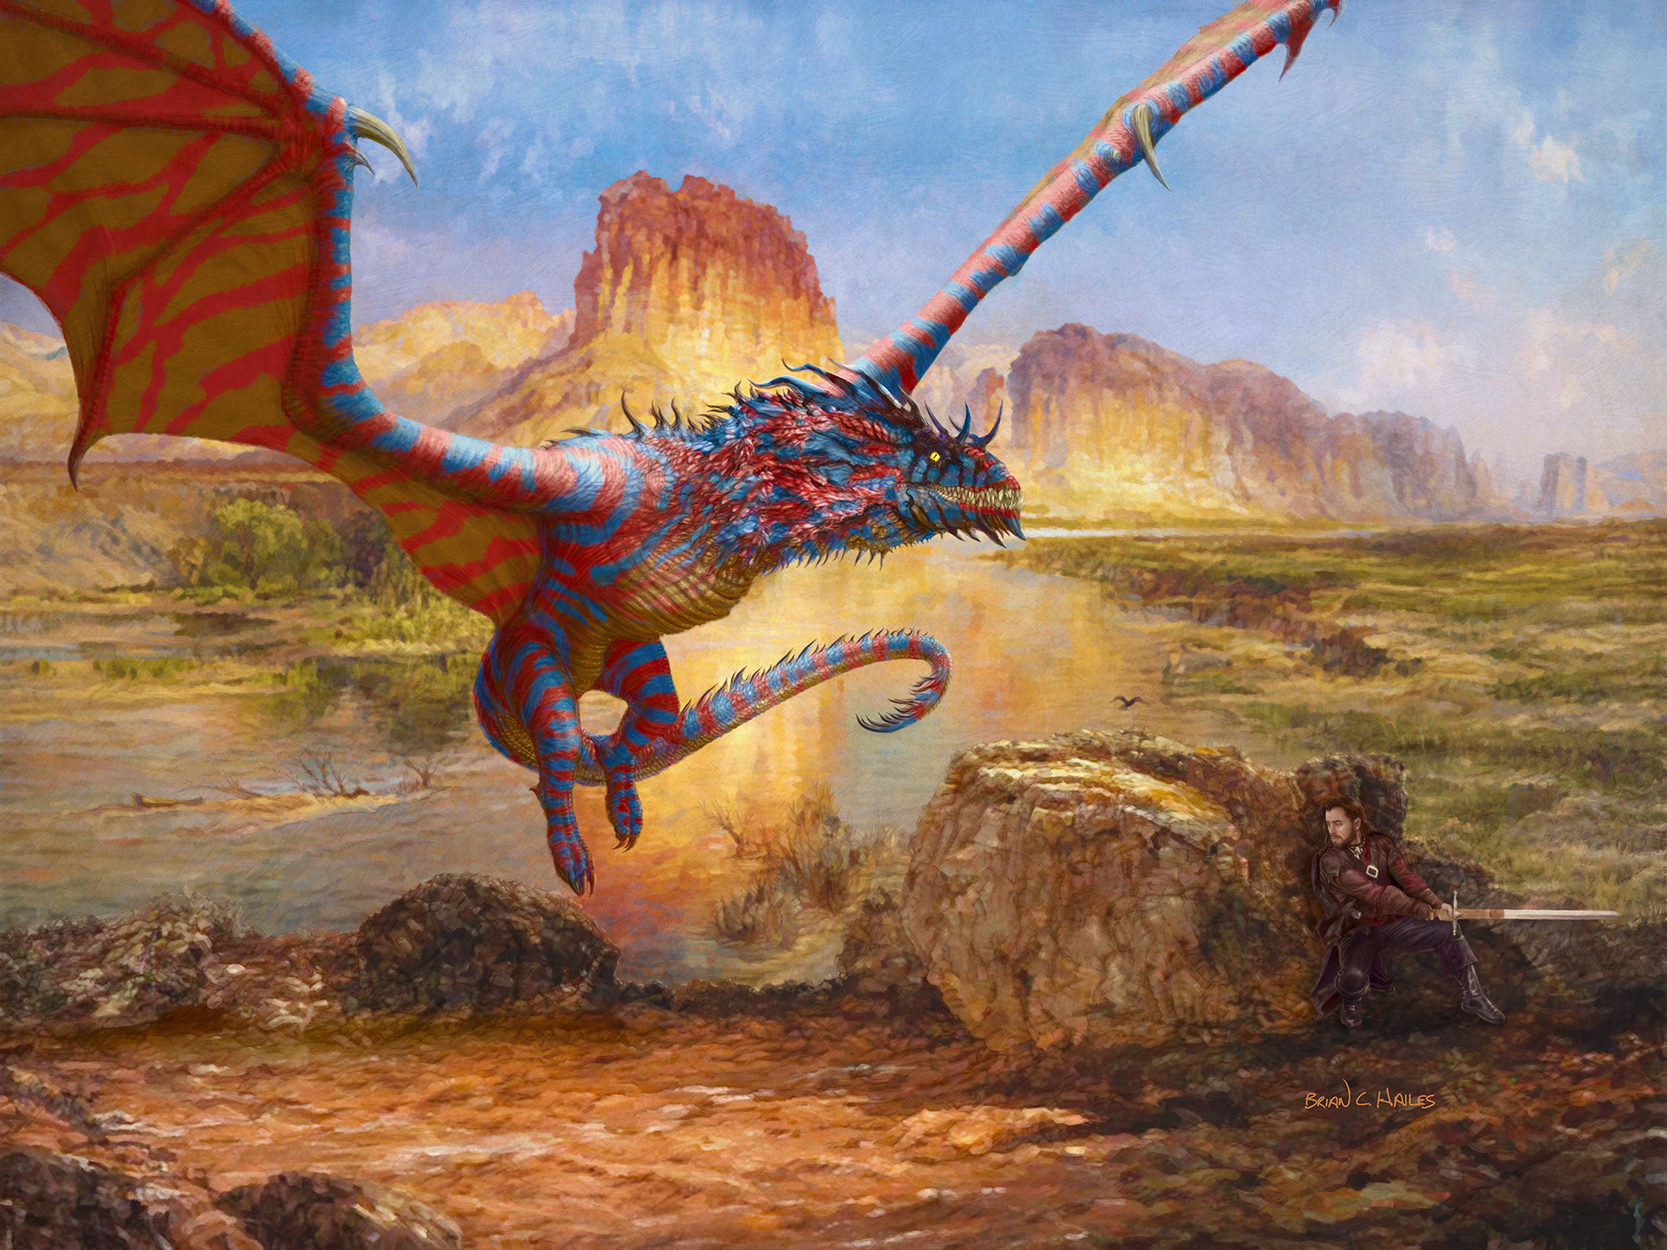 Desert Dragon Artwork by Brian C. Hailes